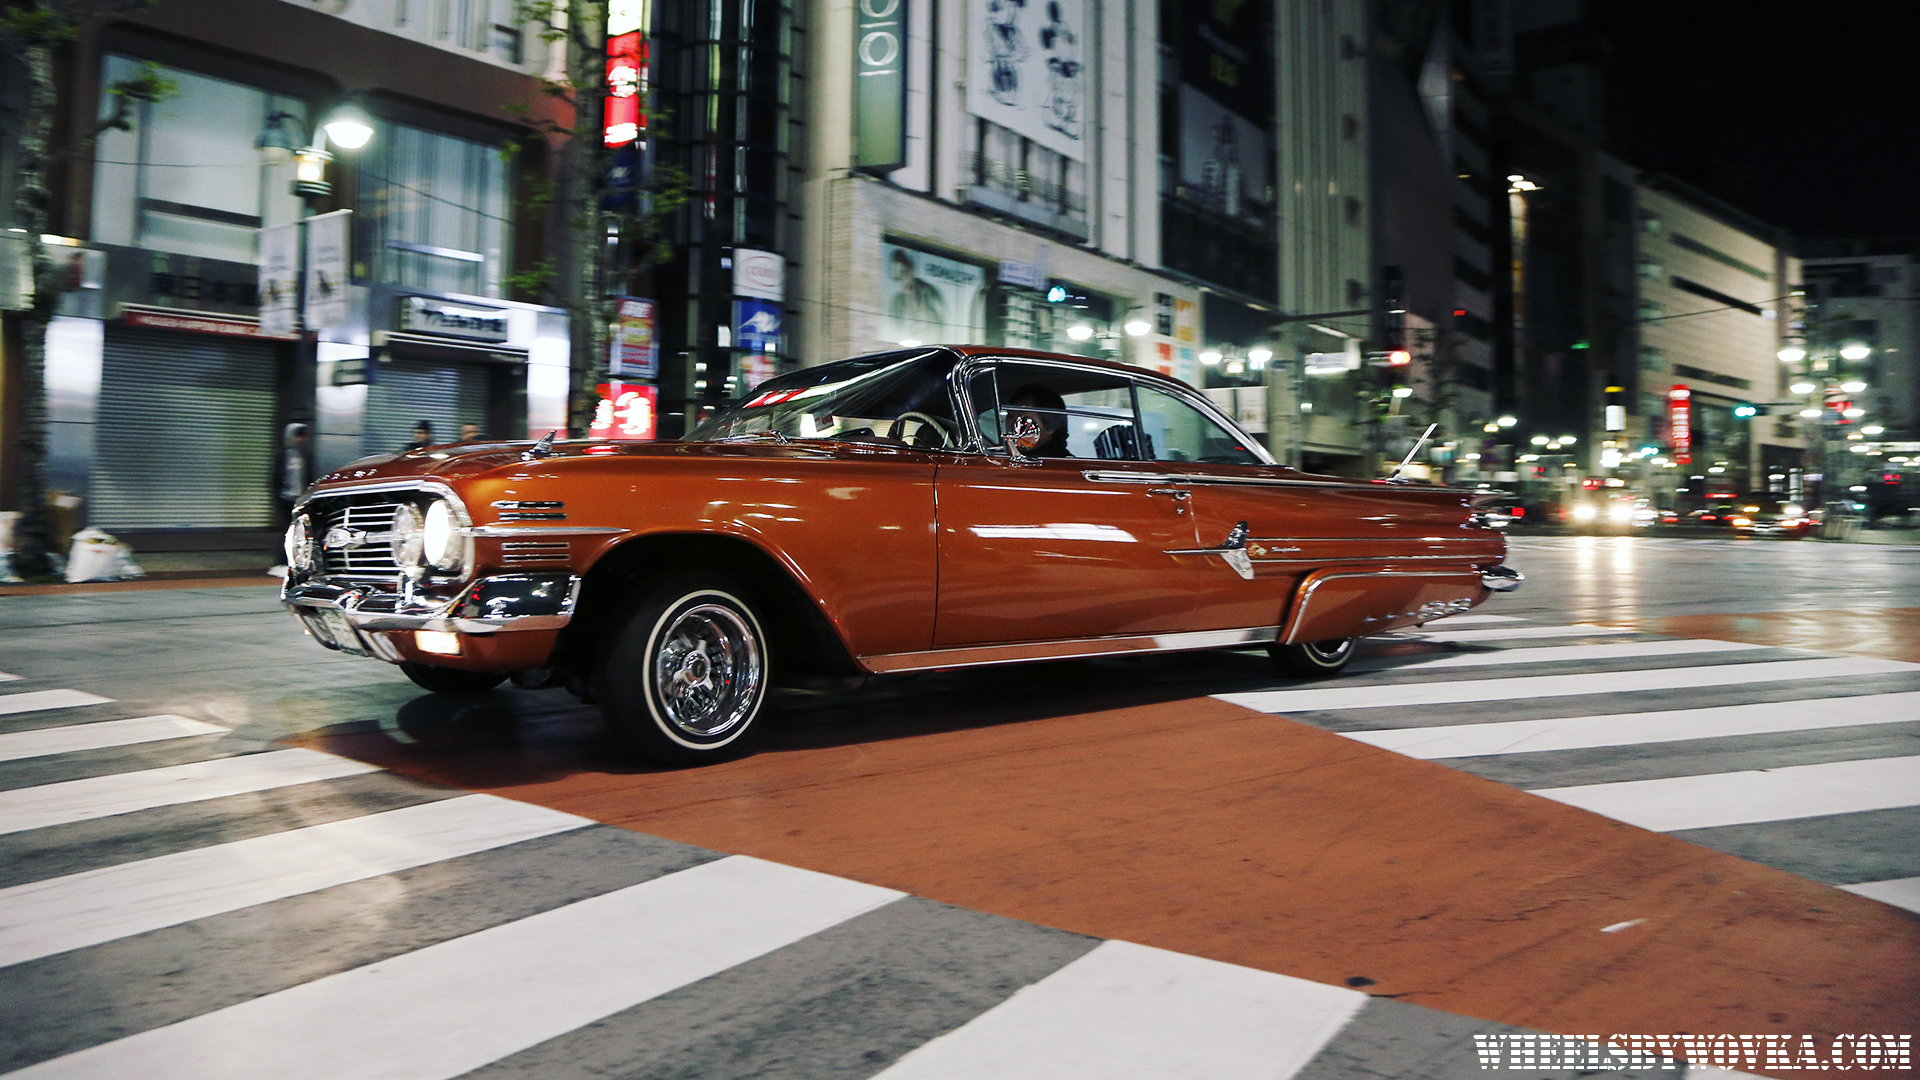 shibuya-japan-tokyo-lowrider-cruise-night-40